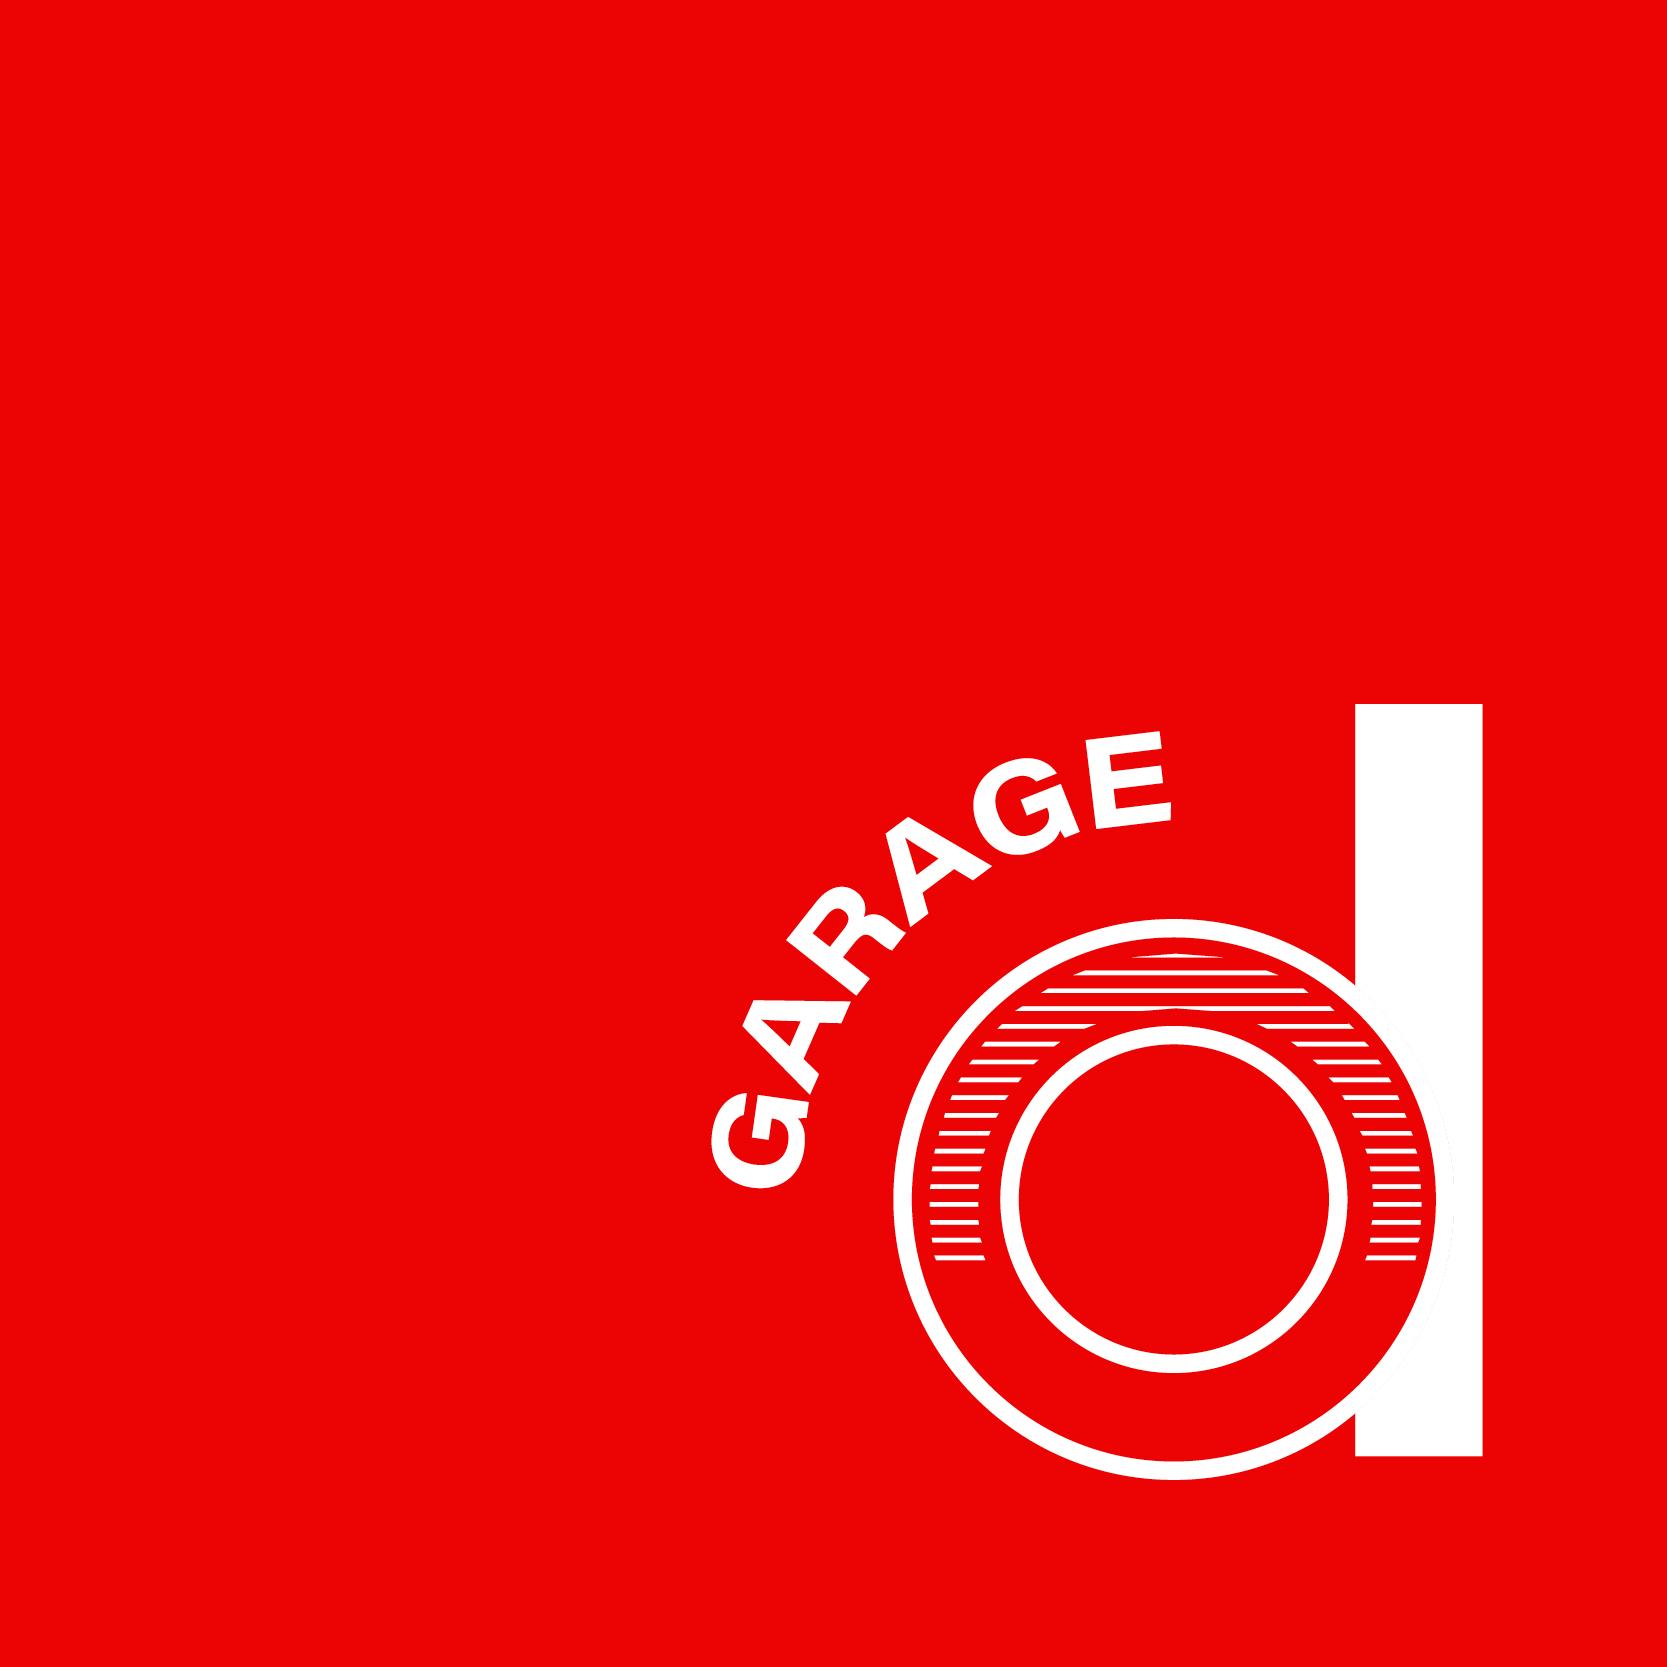 Picto - Garage Dumont